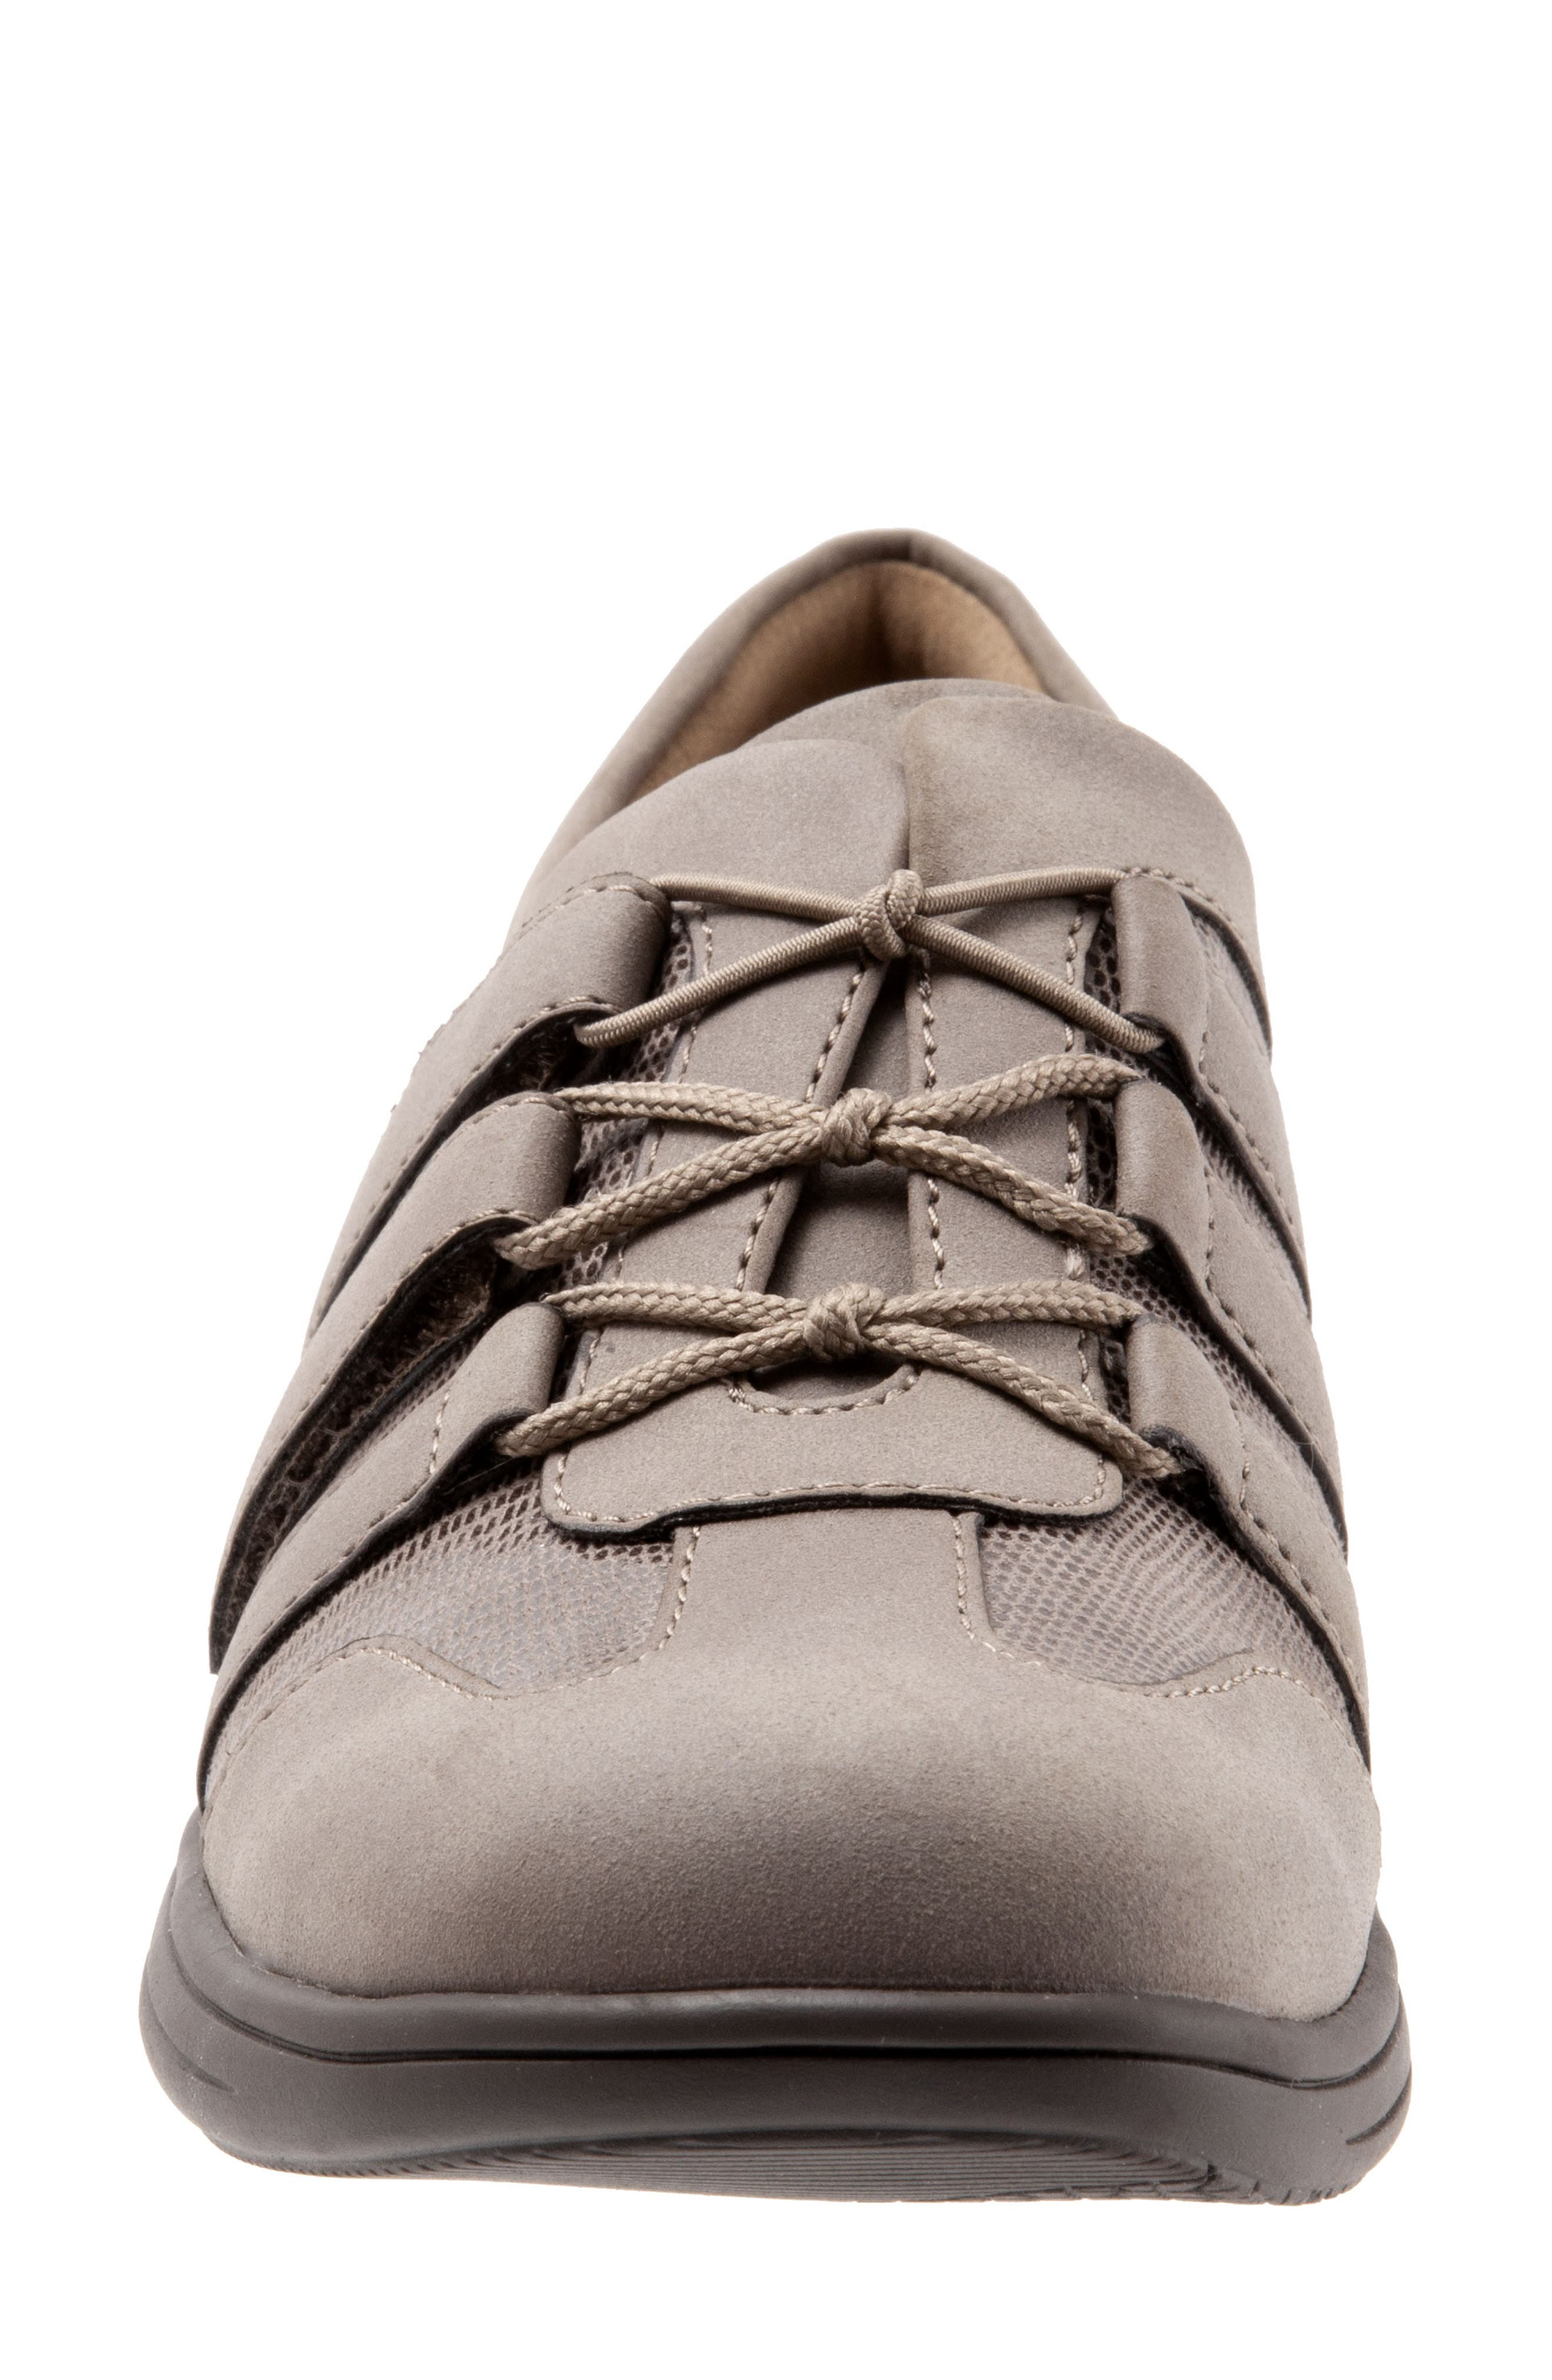 Joy Slip-On Sneaker,                             Alternate thumbnail 4, color,                             TAUPE LEATHER